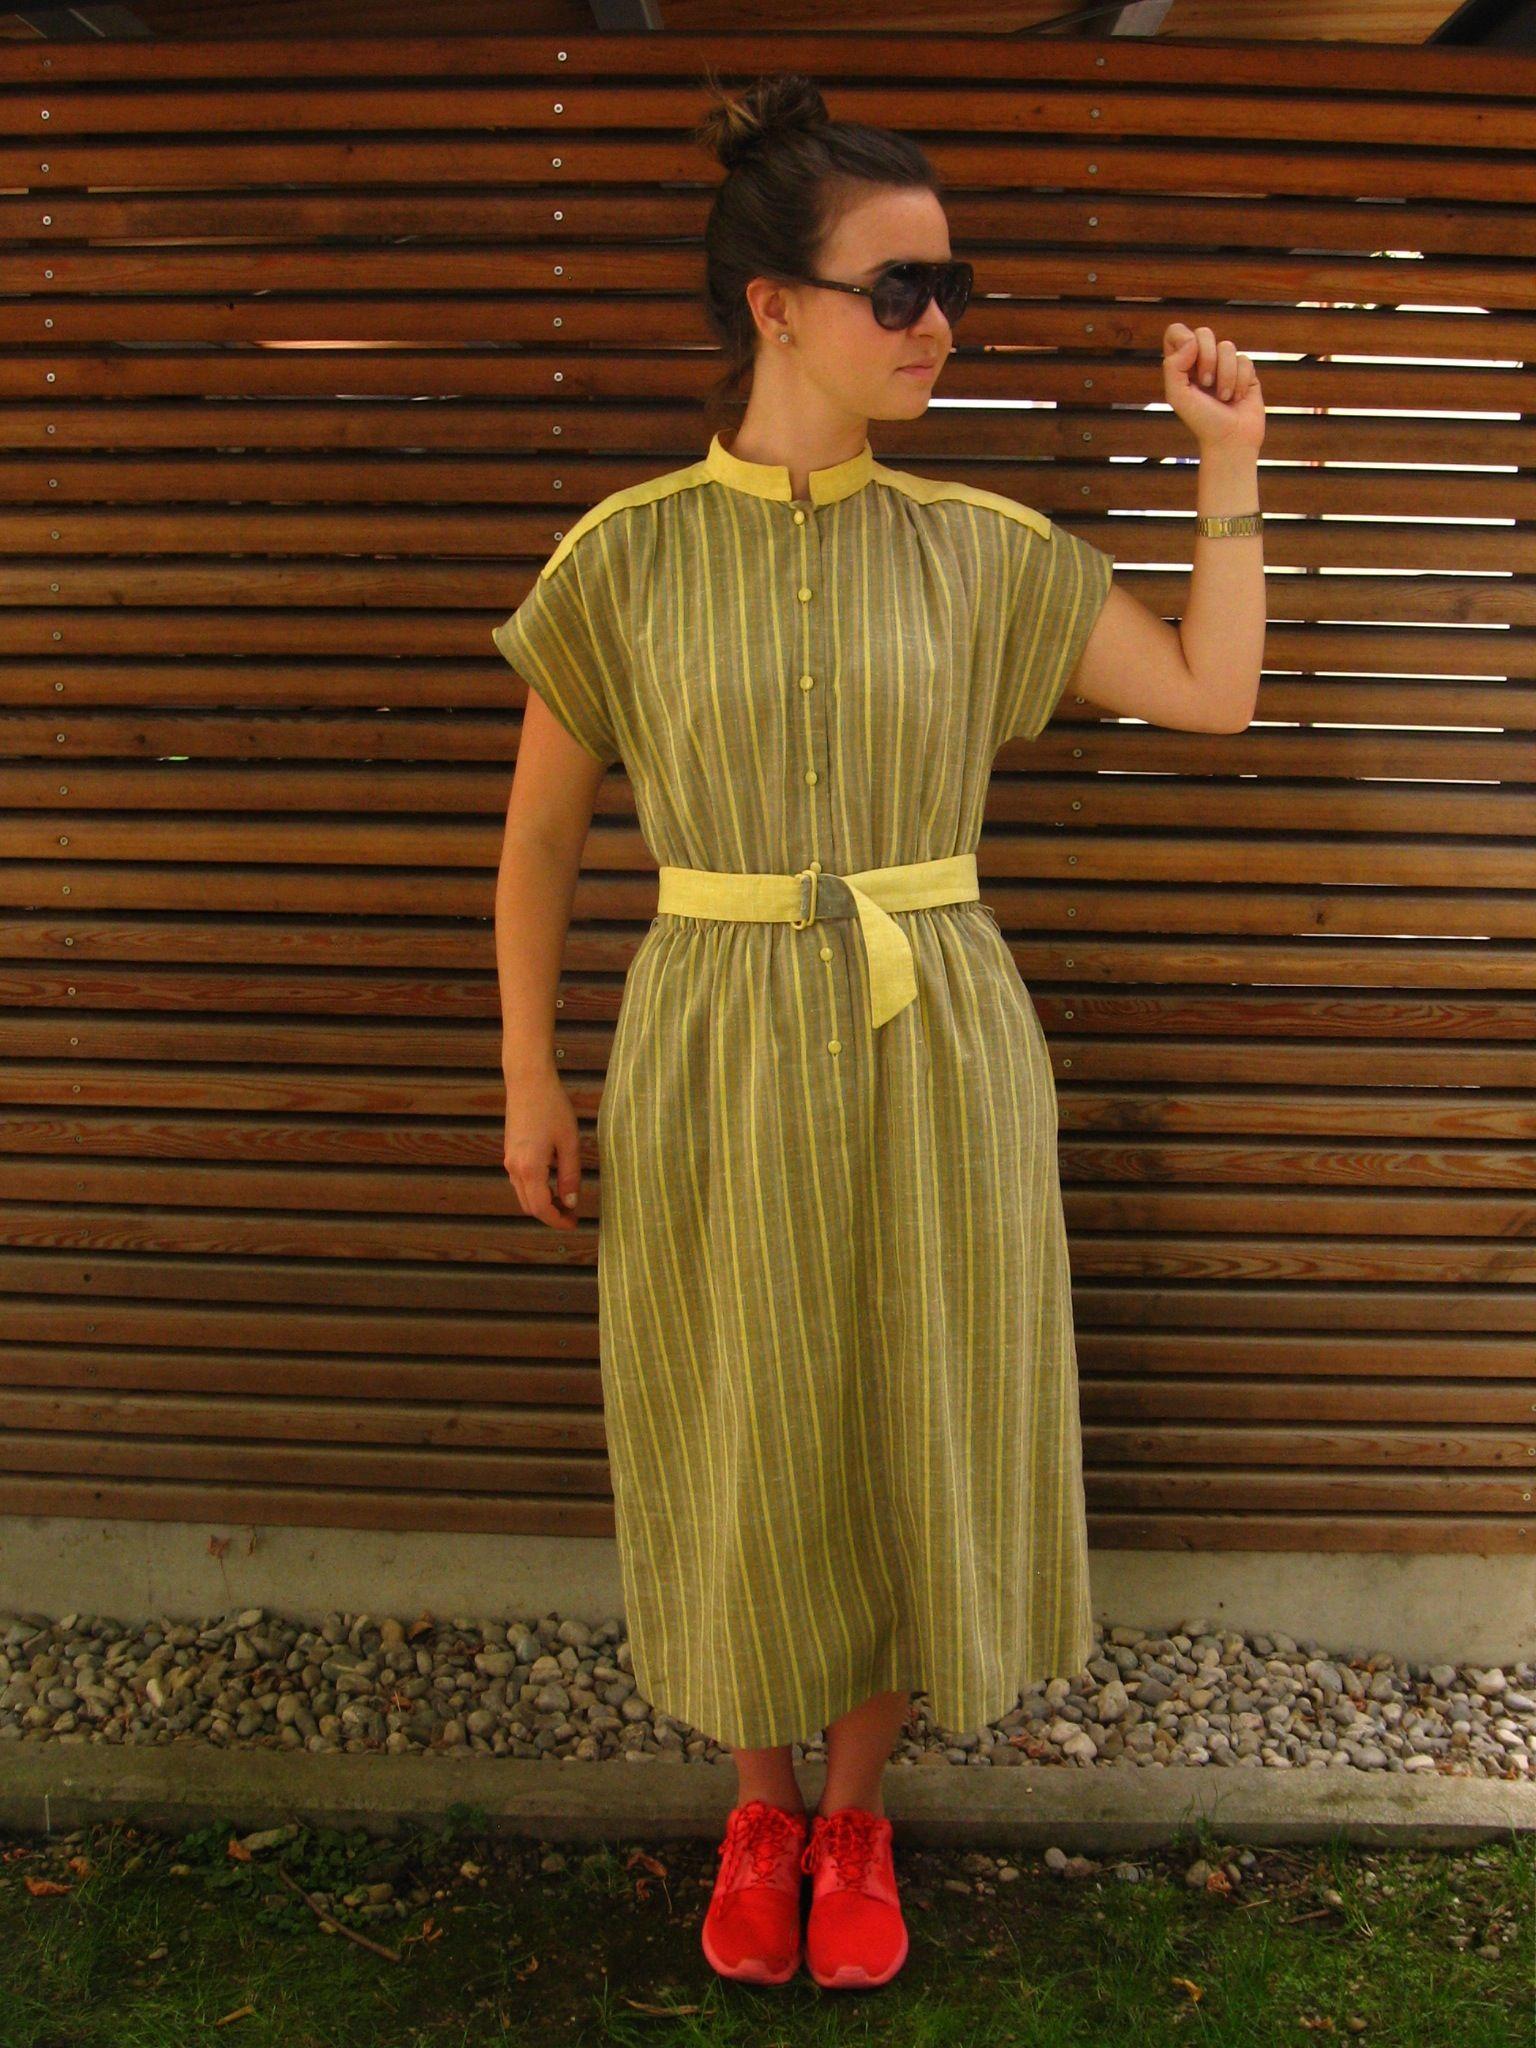 NICE DESIGN DRESS KLEID MODE FASHION GIRL HANDMADE - MAKE ...